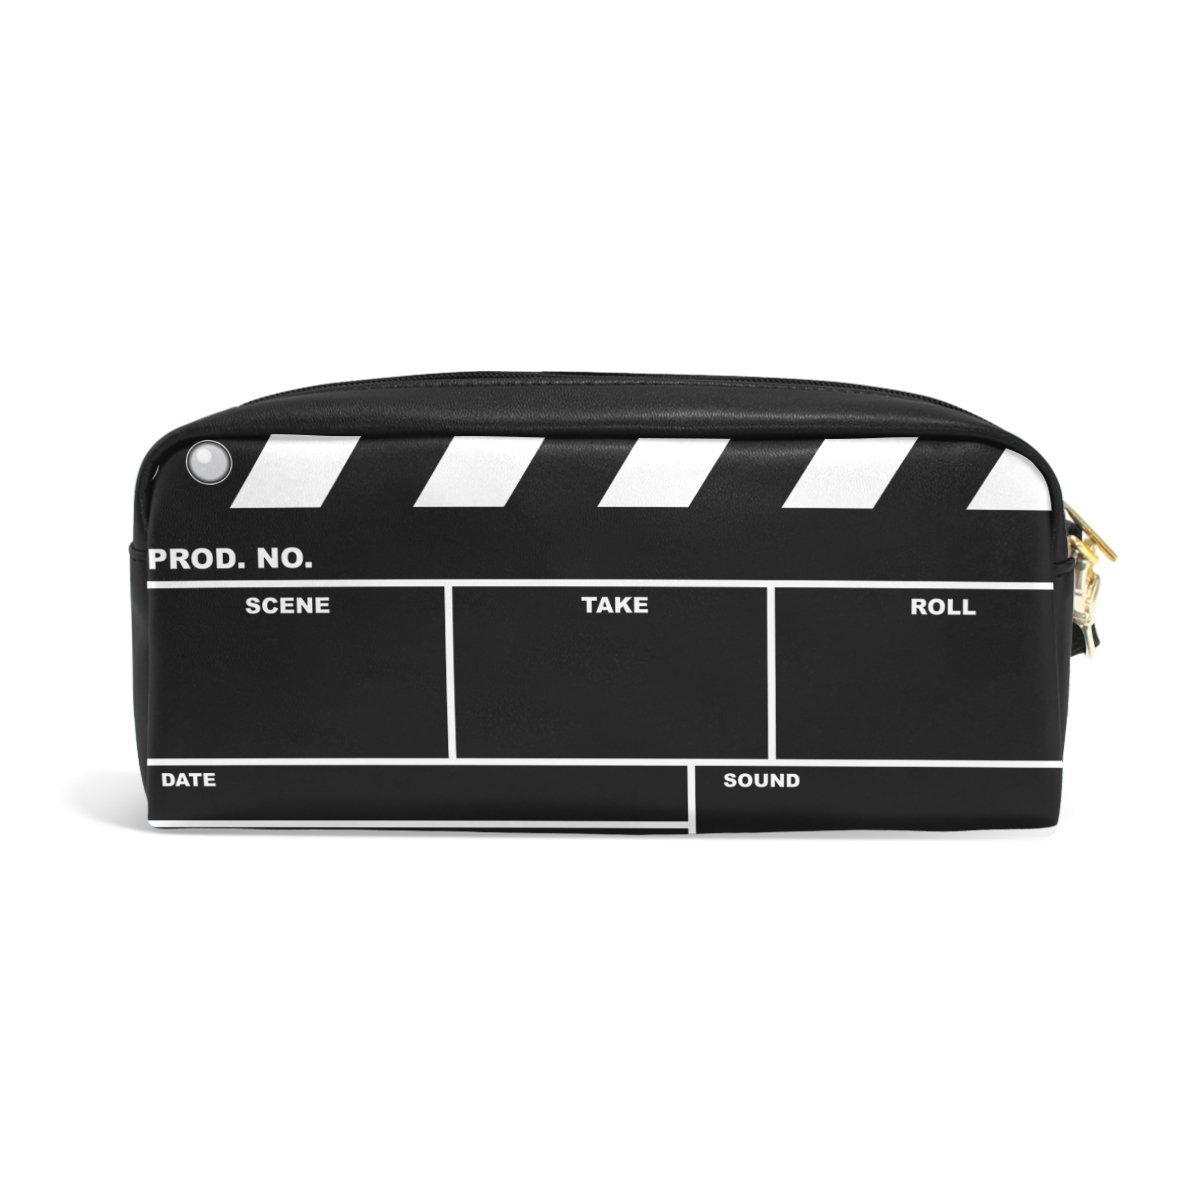 ZZKKO Movie Clapboard Leather Zipper Pencil Case Pen Stationary Bag Cosmetic Makeup Bag Pouch Purse